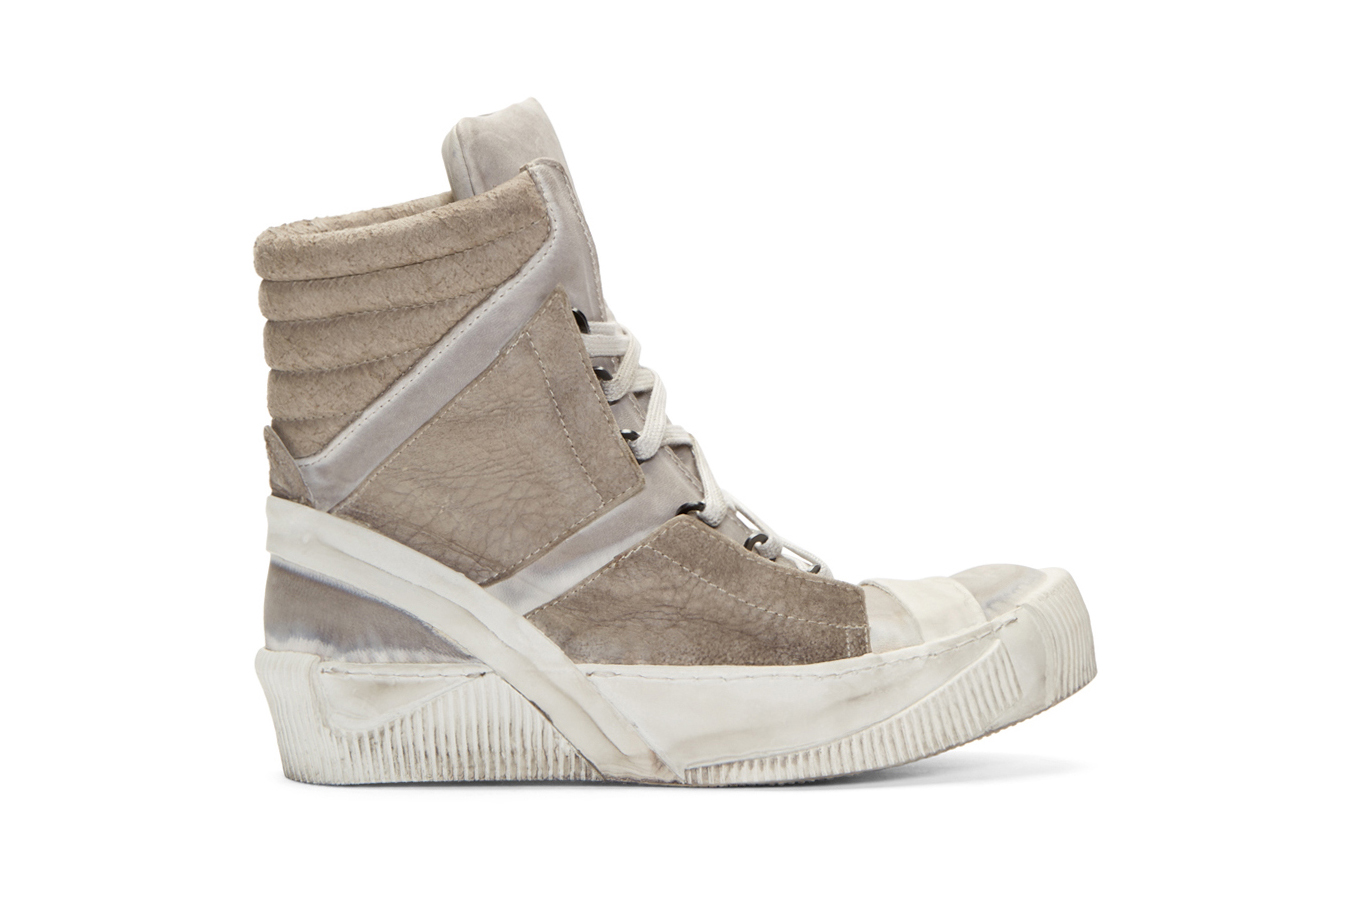 Boris Bidjan Saberi 2015 Fall/Winter Footwear Collection